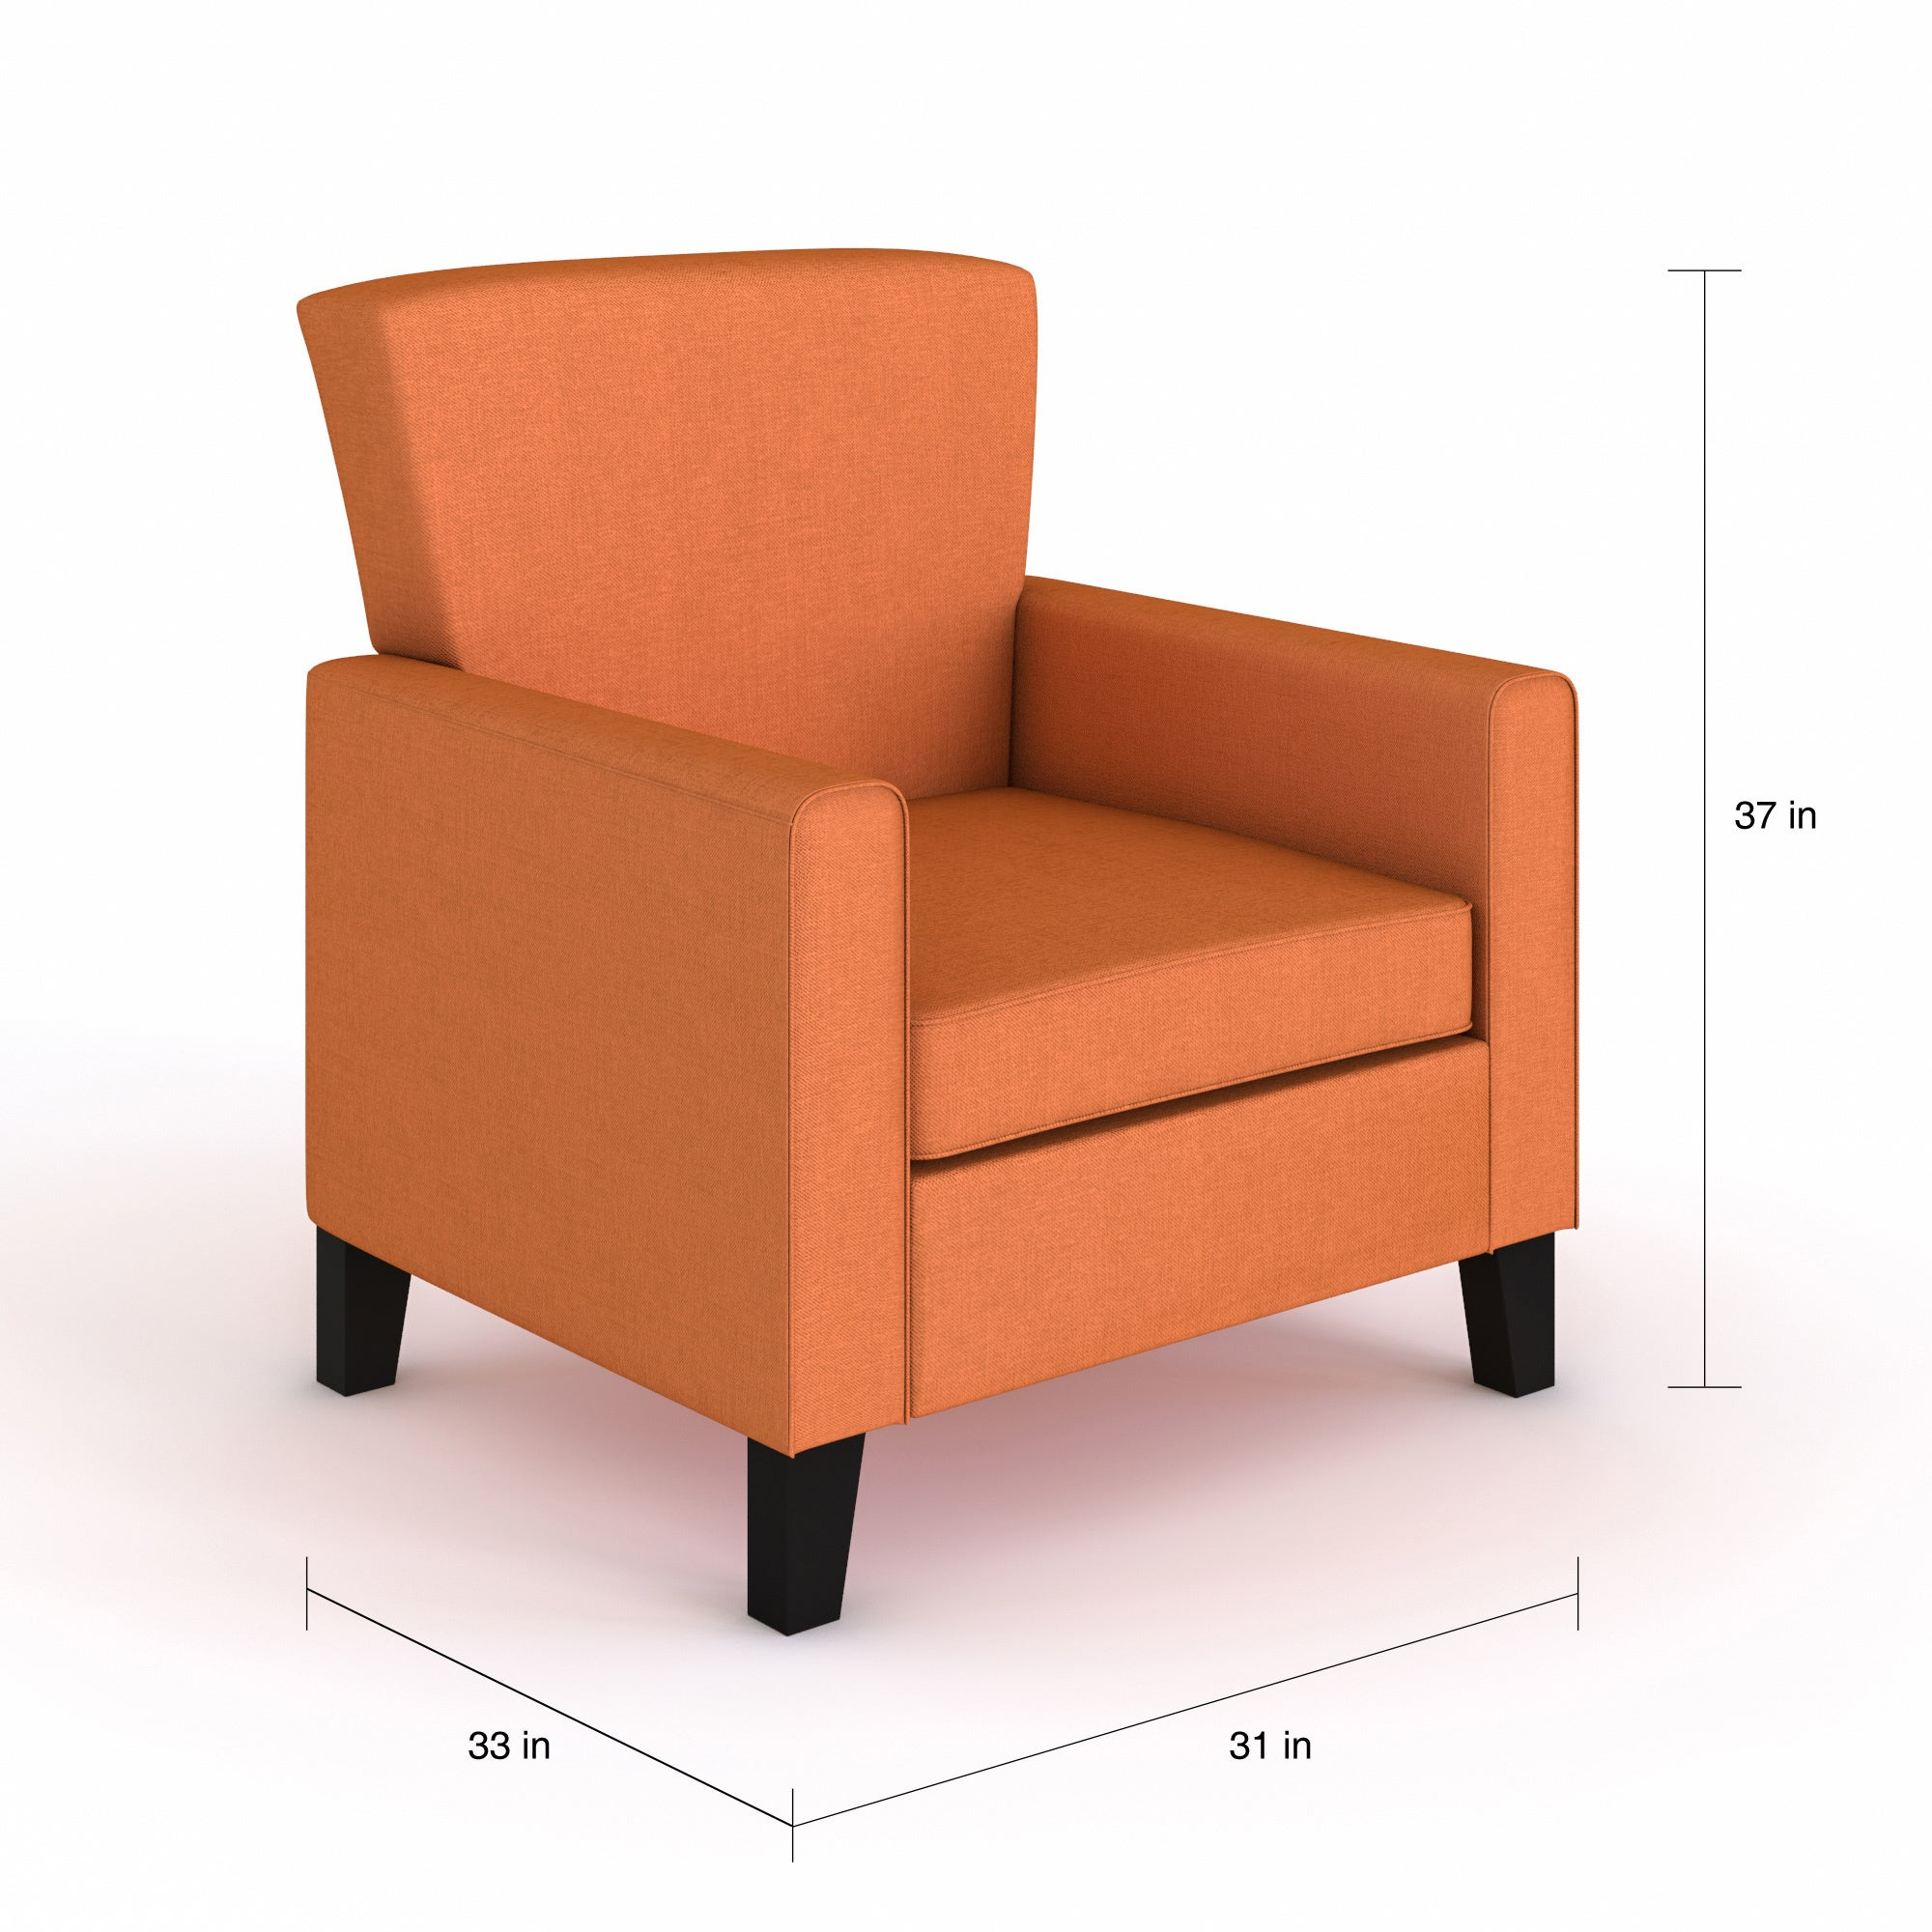 Superb Porch Den Tallman Orange Accent Chair 30 X 32 X 37 Pdpeps Interior Chair Design Pdpepsorg